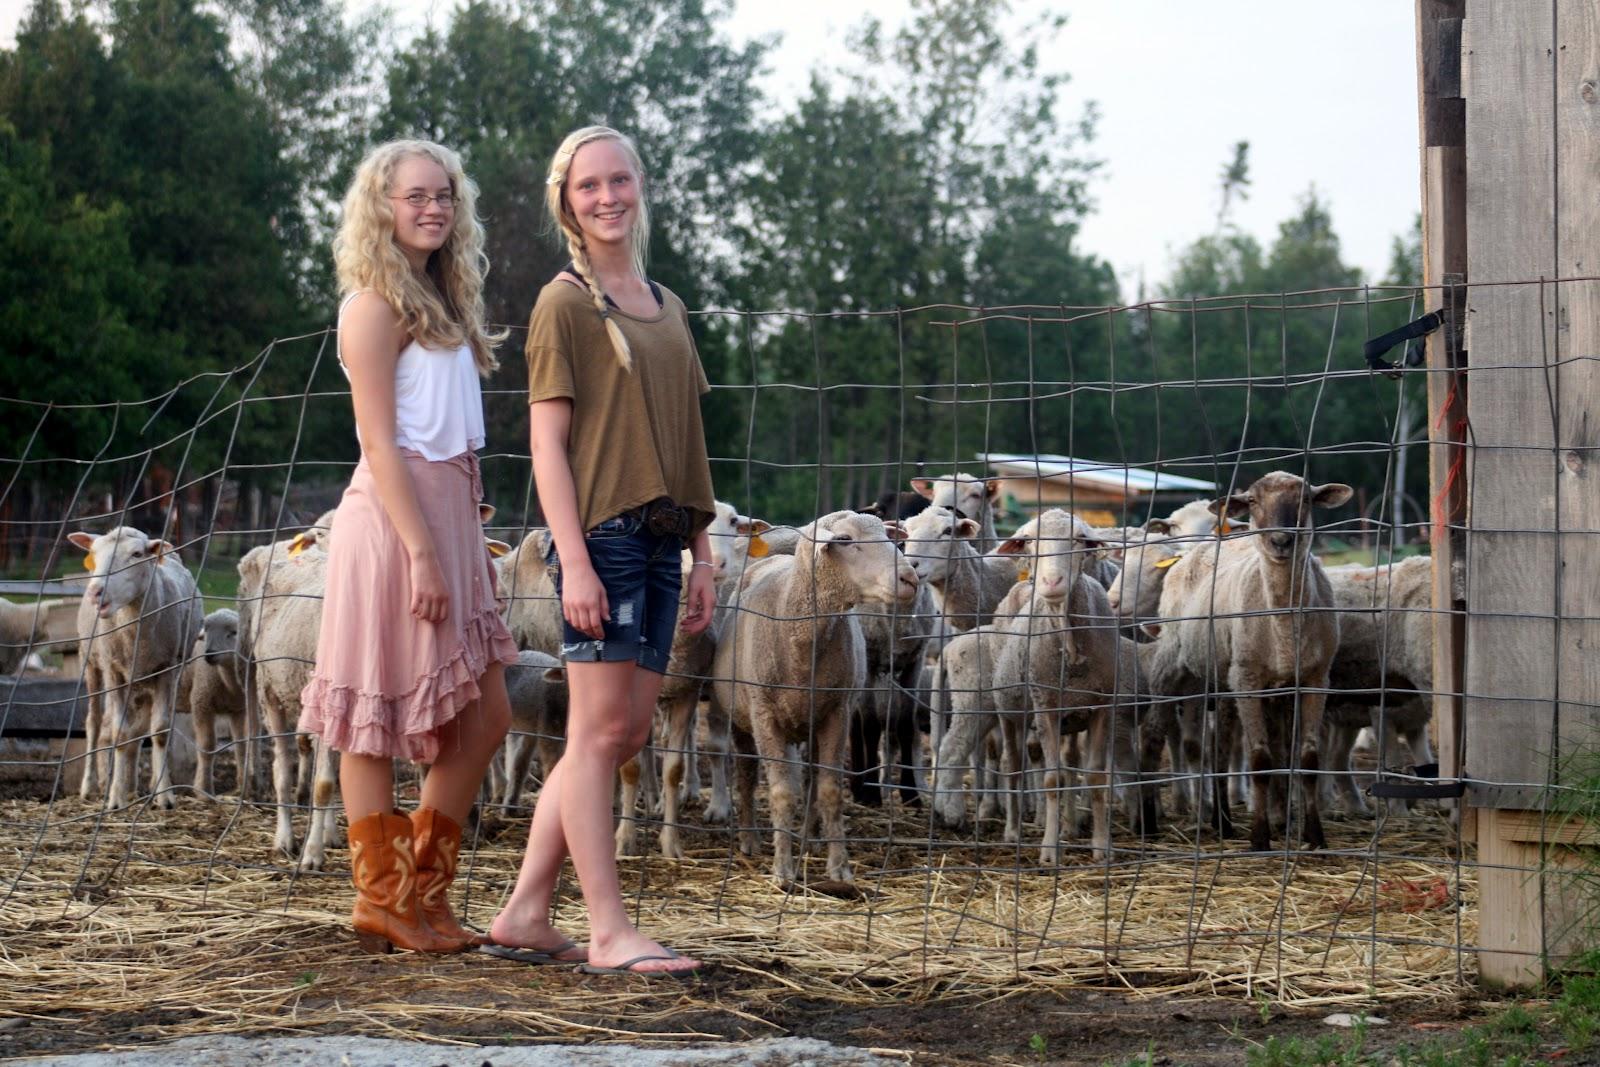 Young girls on the farm free video, cigarette smoking sluts fucking porn